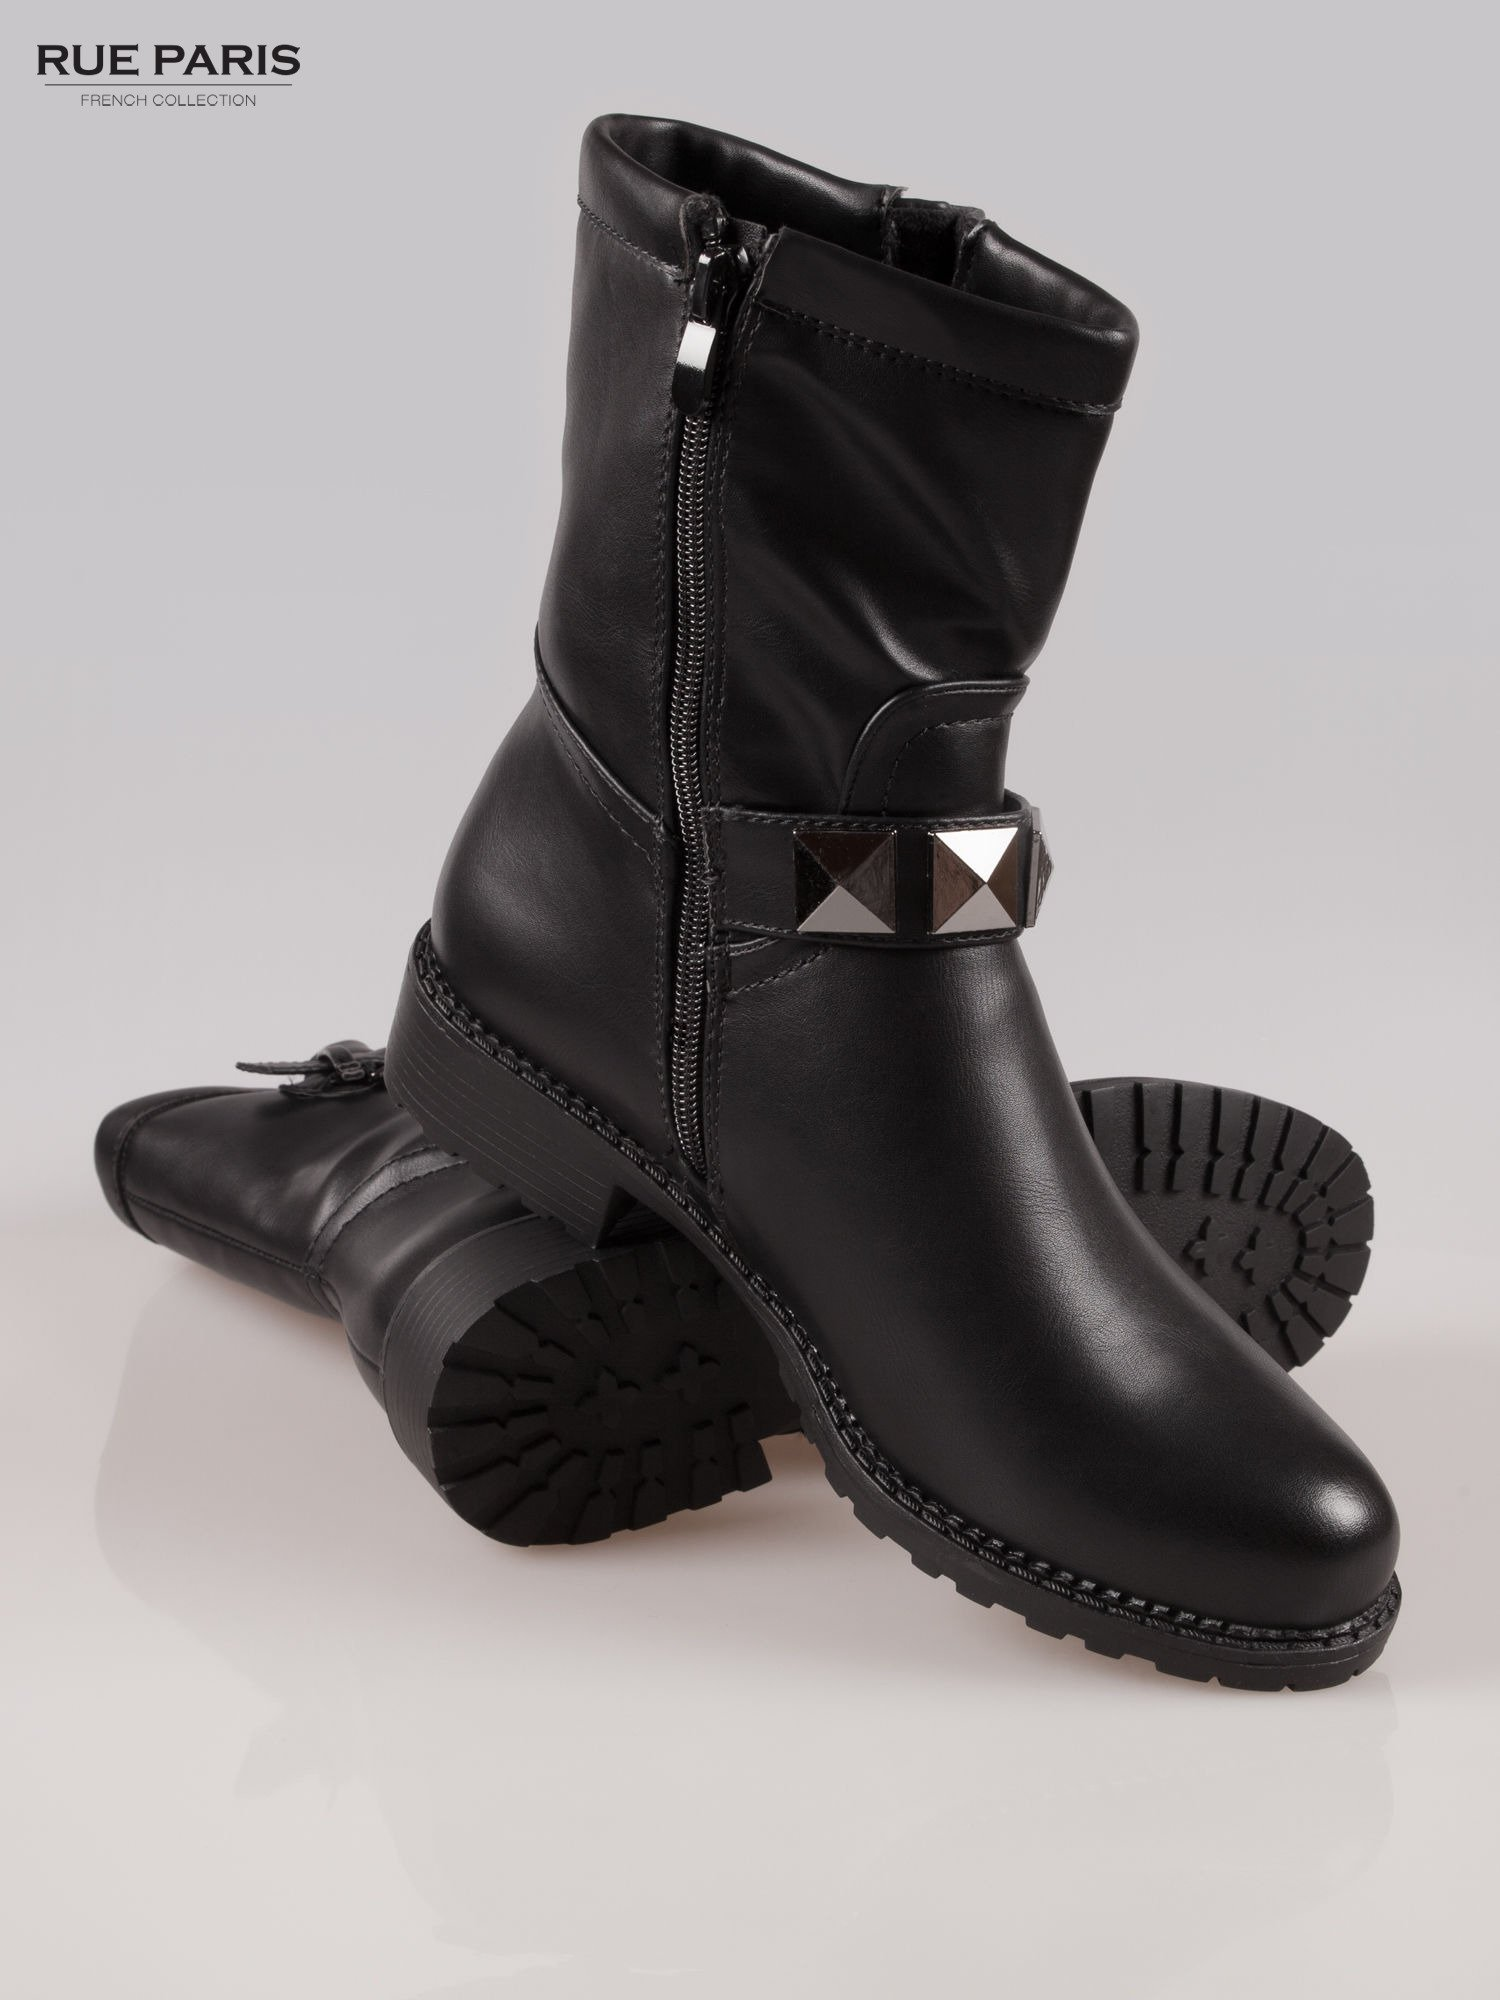 Czarne botki biker boots z klamerkami                                  zdj.                                  4